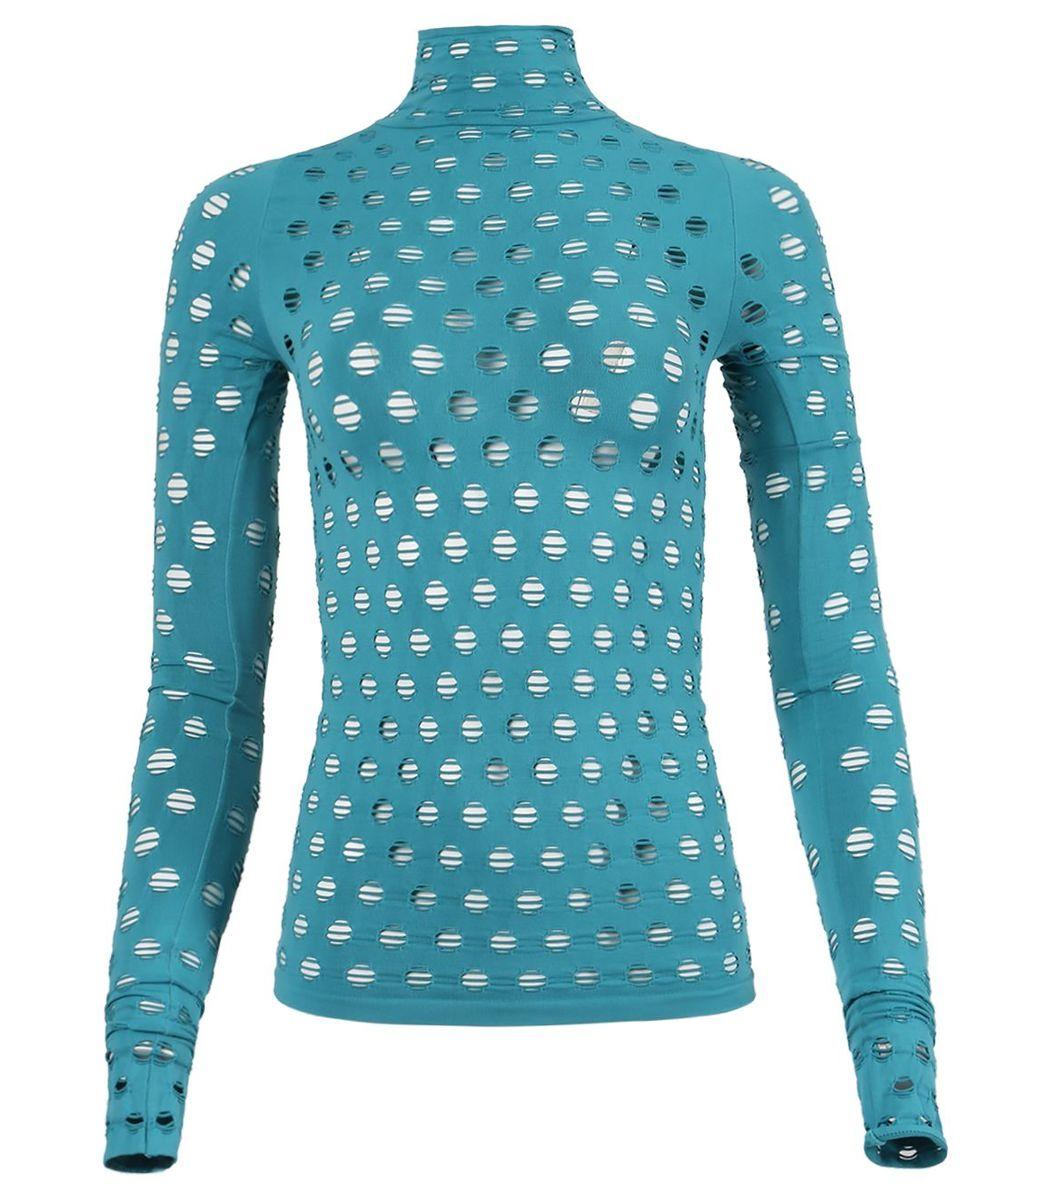 Maisie Wilen Perforated Turtleneck Top, Aqua